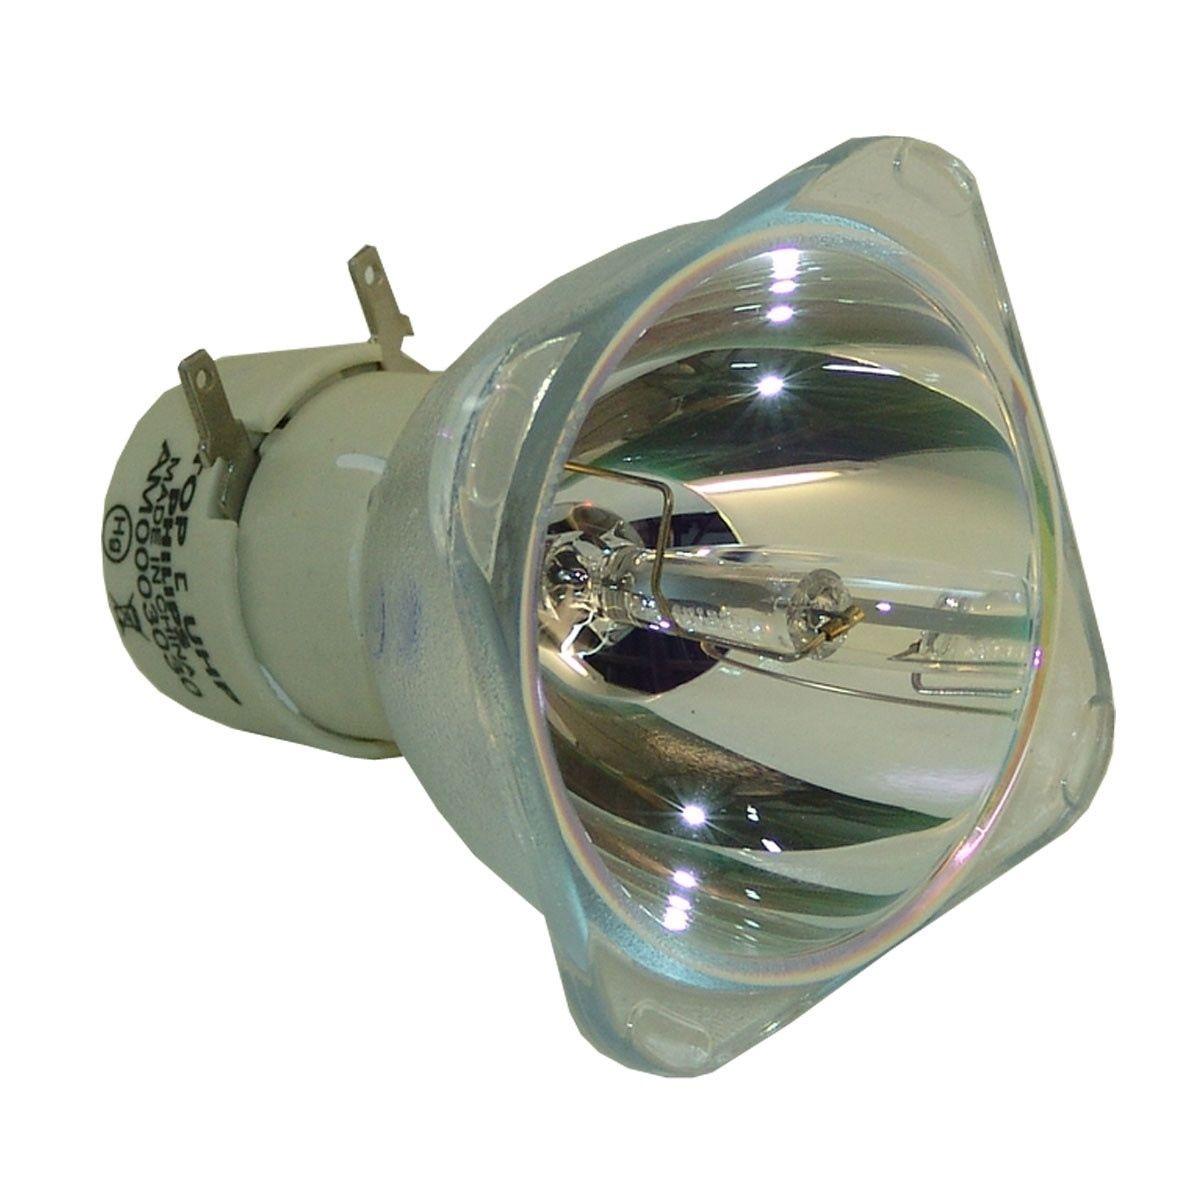 Bombilla Compatible 5J. J7C05.001 para BENQ MX815ST MX816ST bombilla para proyector sin carcasa